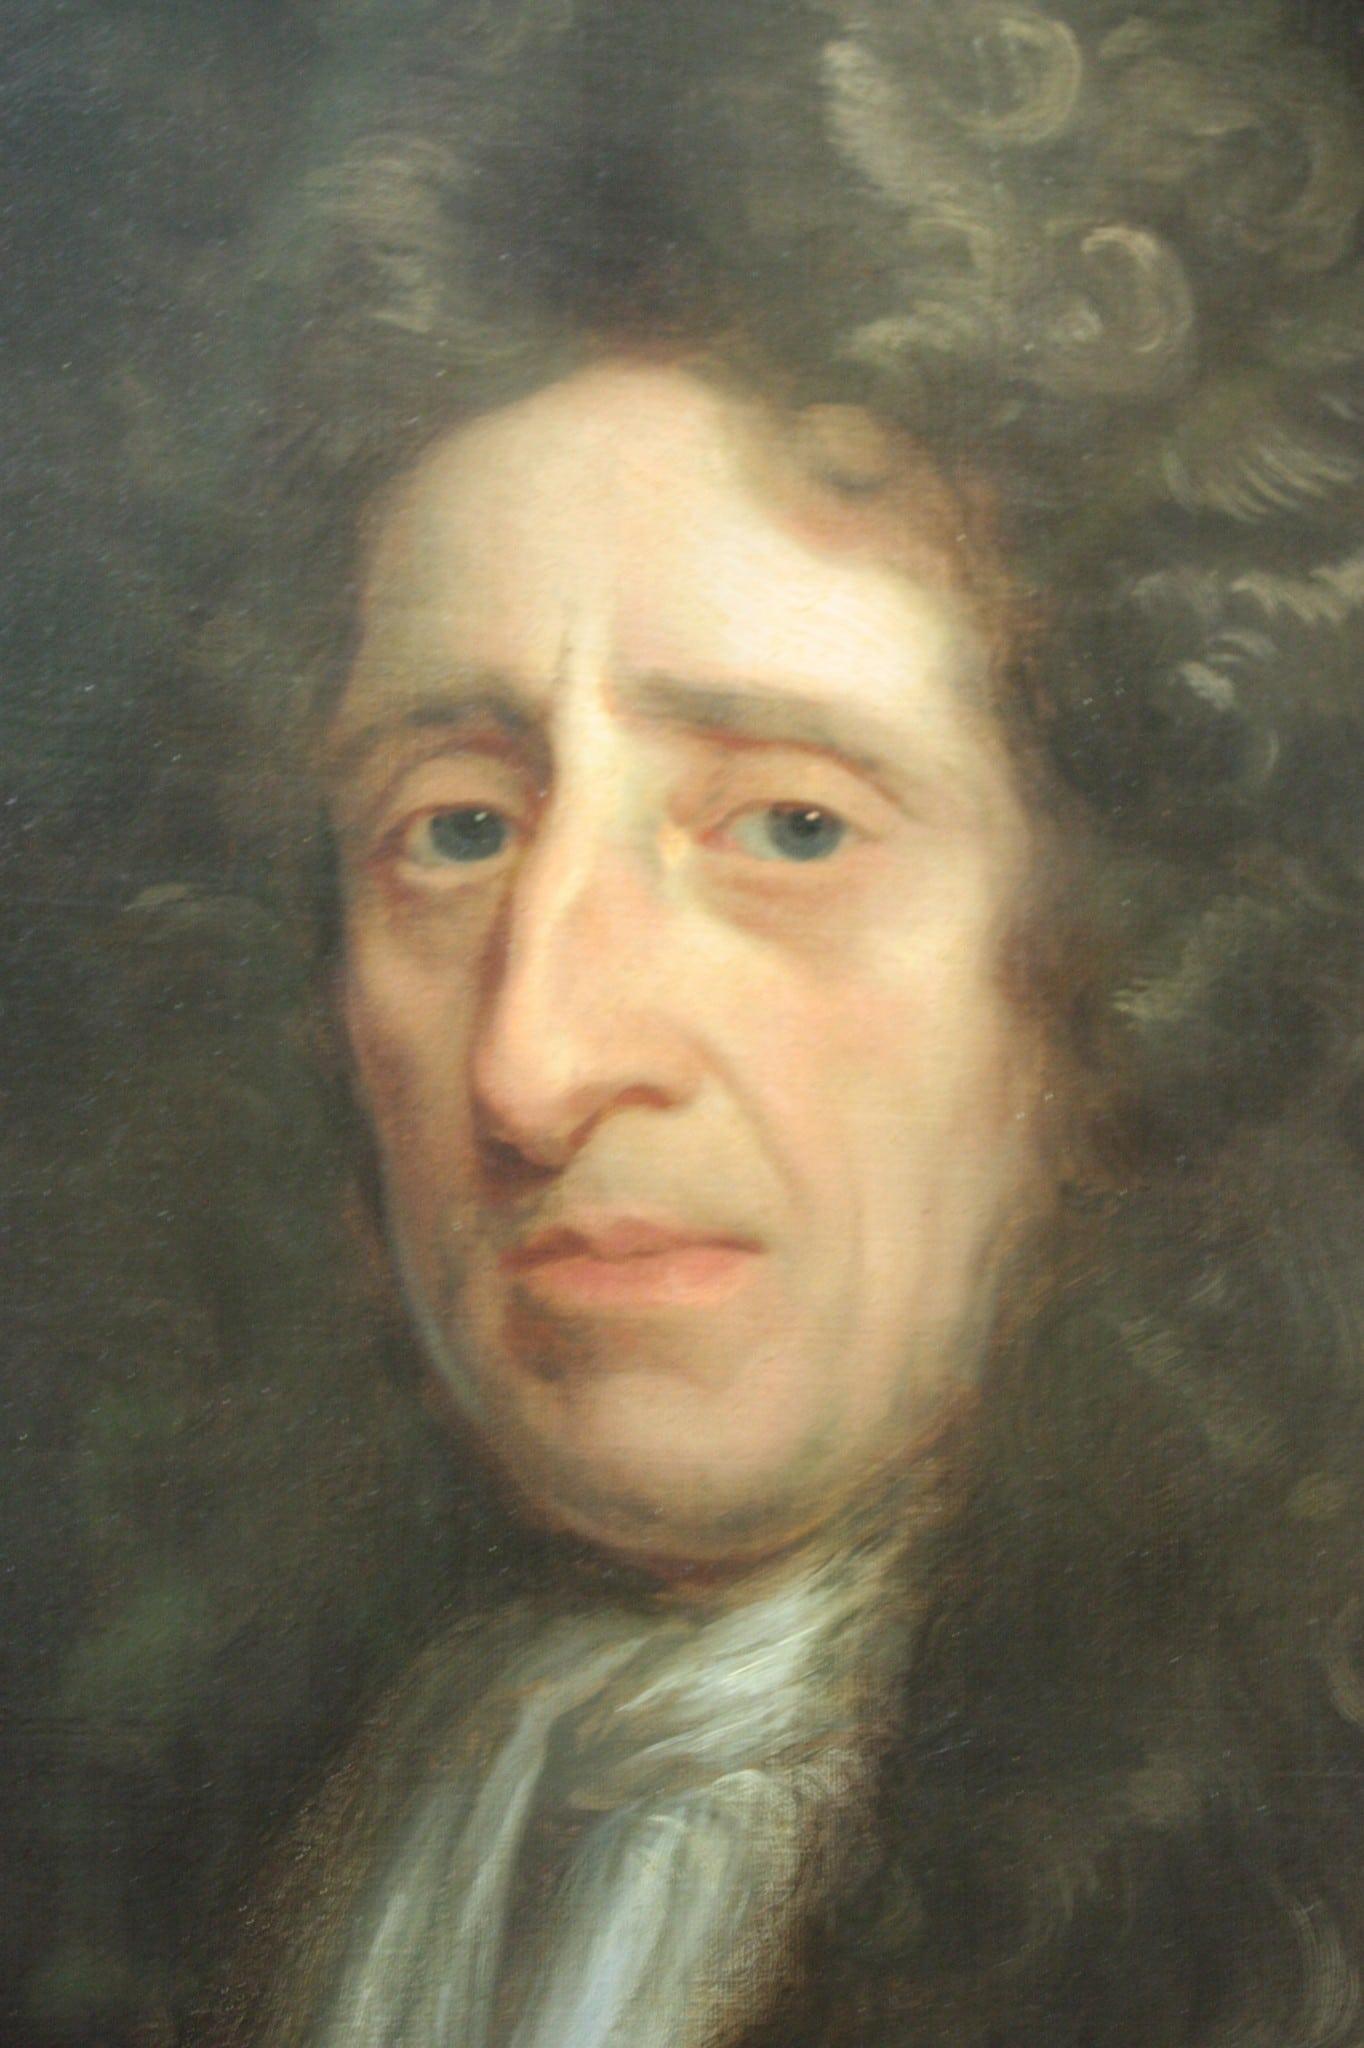 John Locke Philosopher and Physician